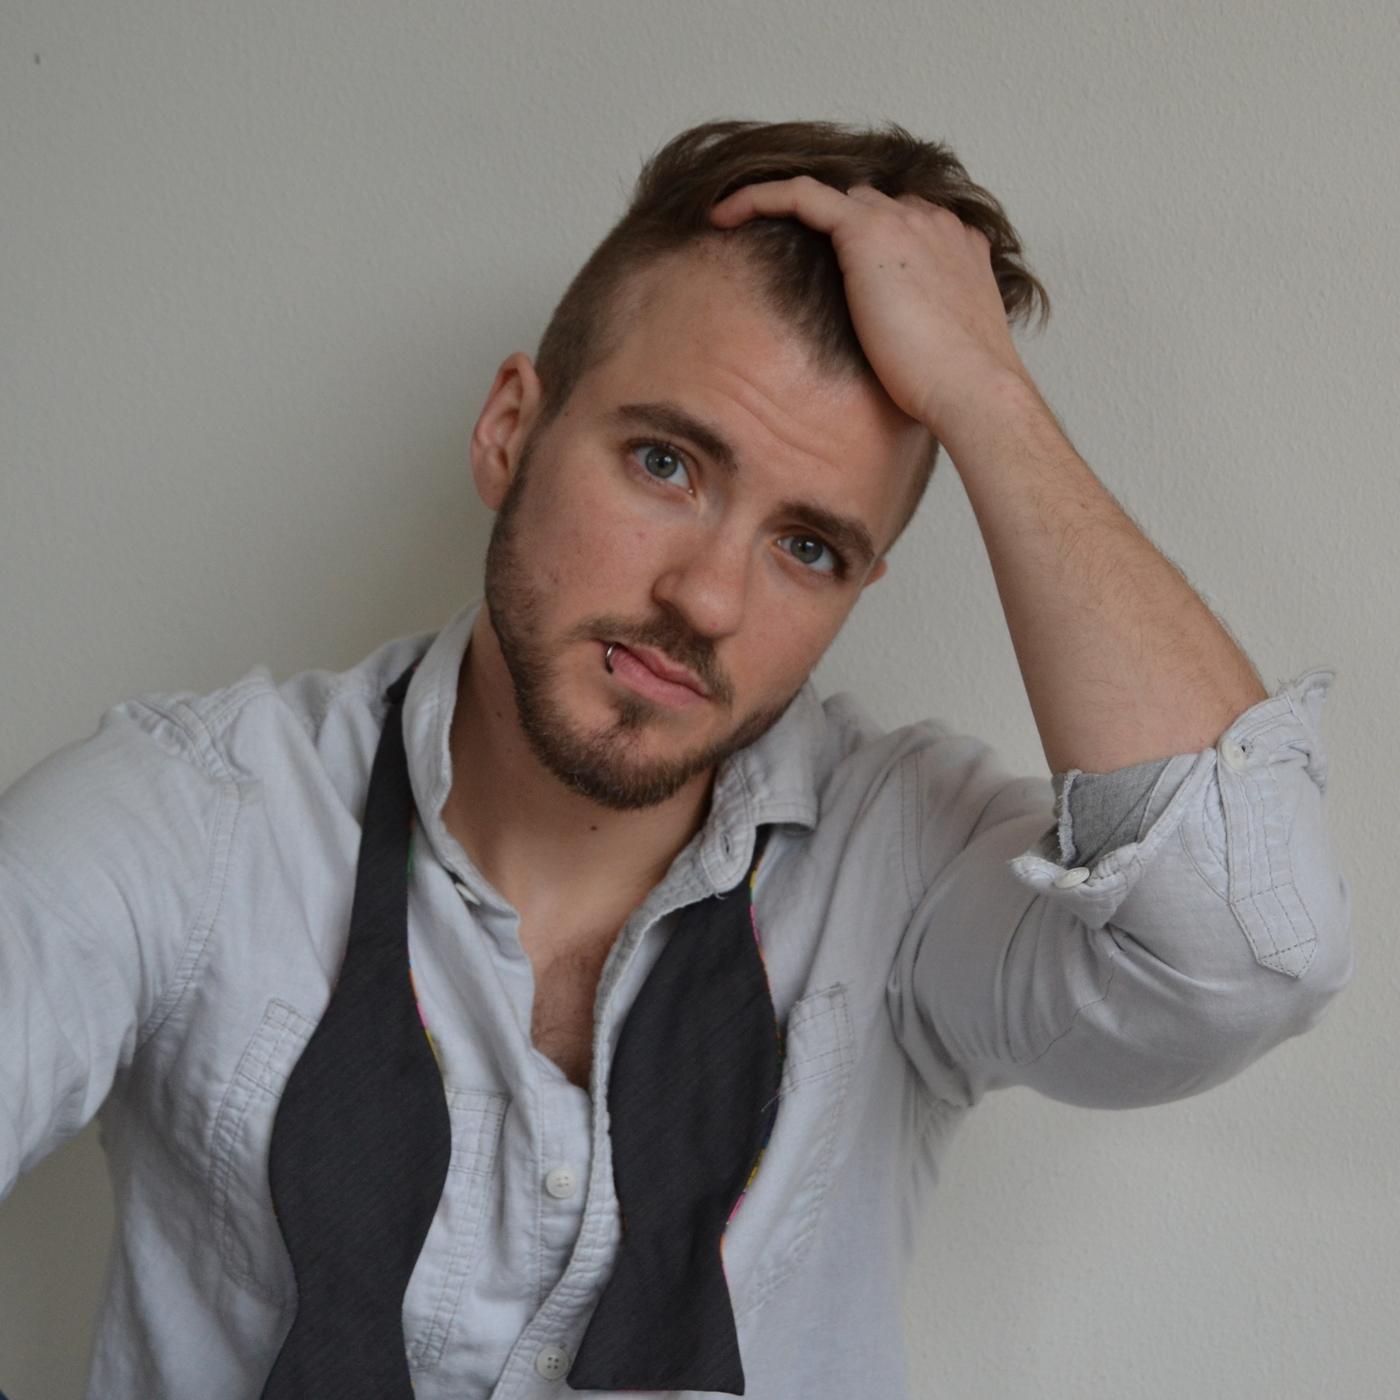 Transgender Man Leads Mens Health Cover Model Contest : NPR